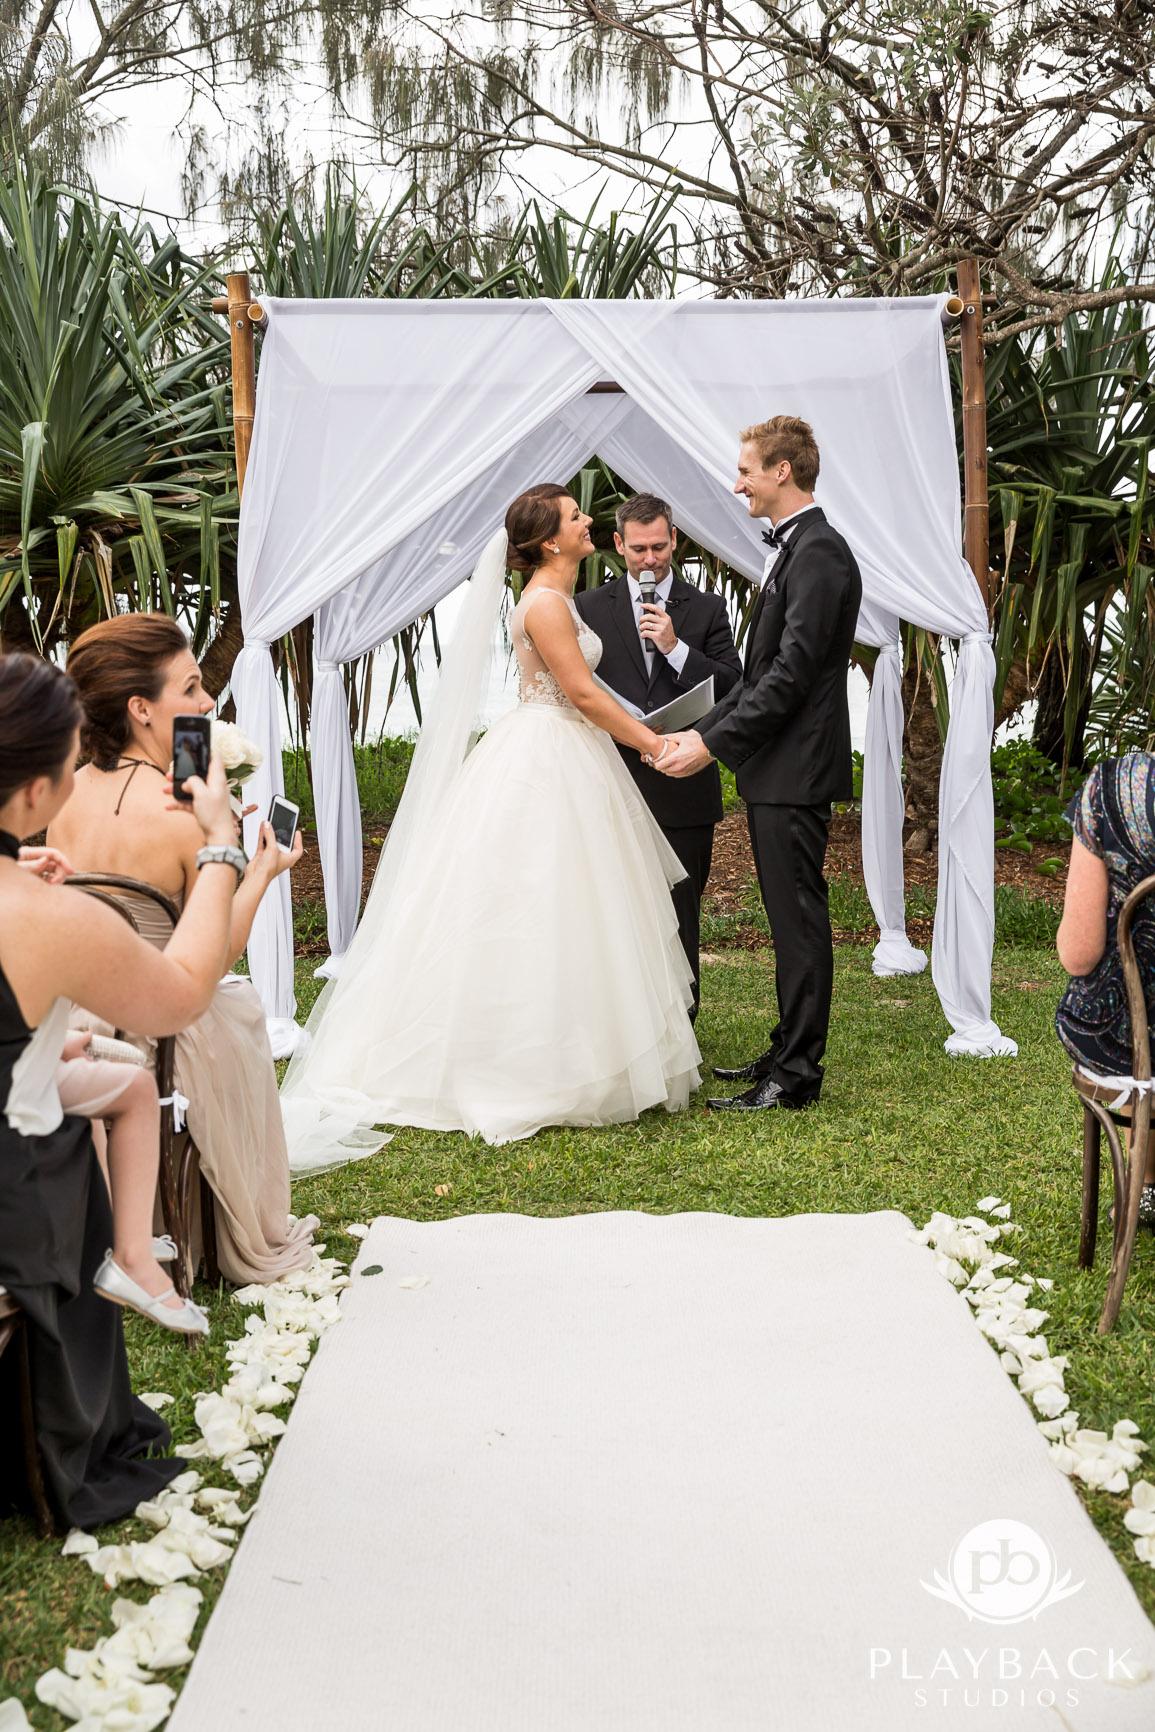 Sunshine_Coast_Noosa_Wedding_Photography_Playback_Studios_Anita_Peter-21.jpg